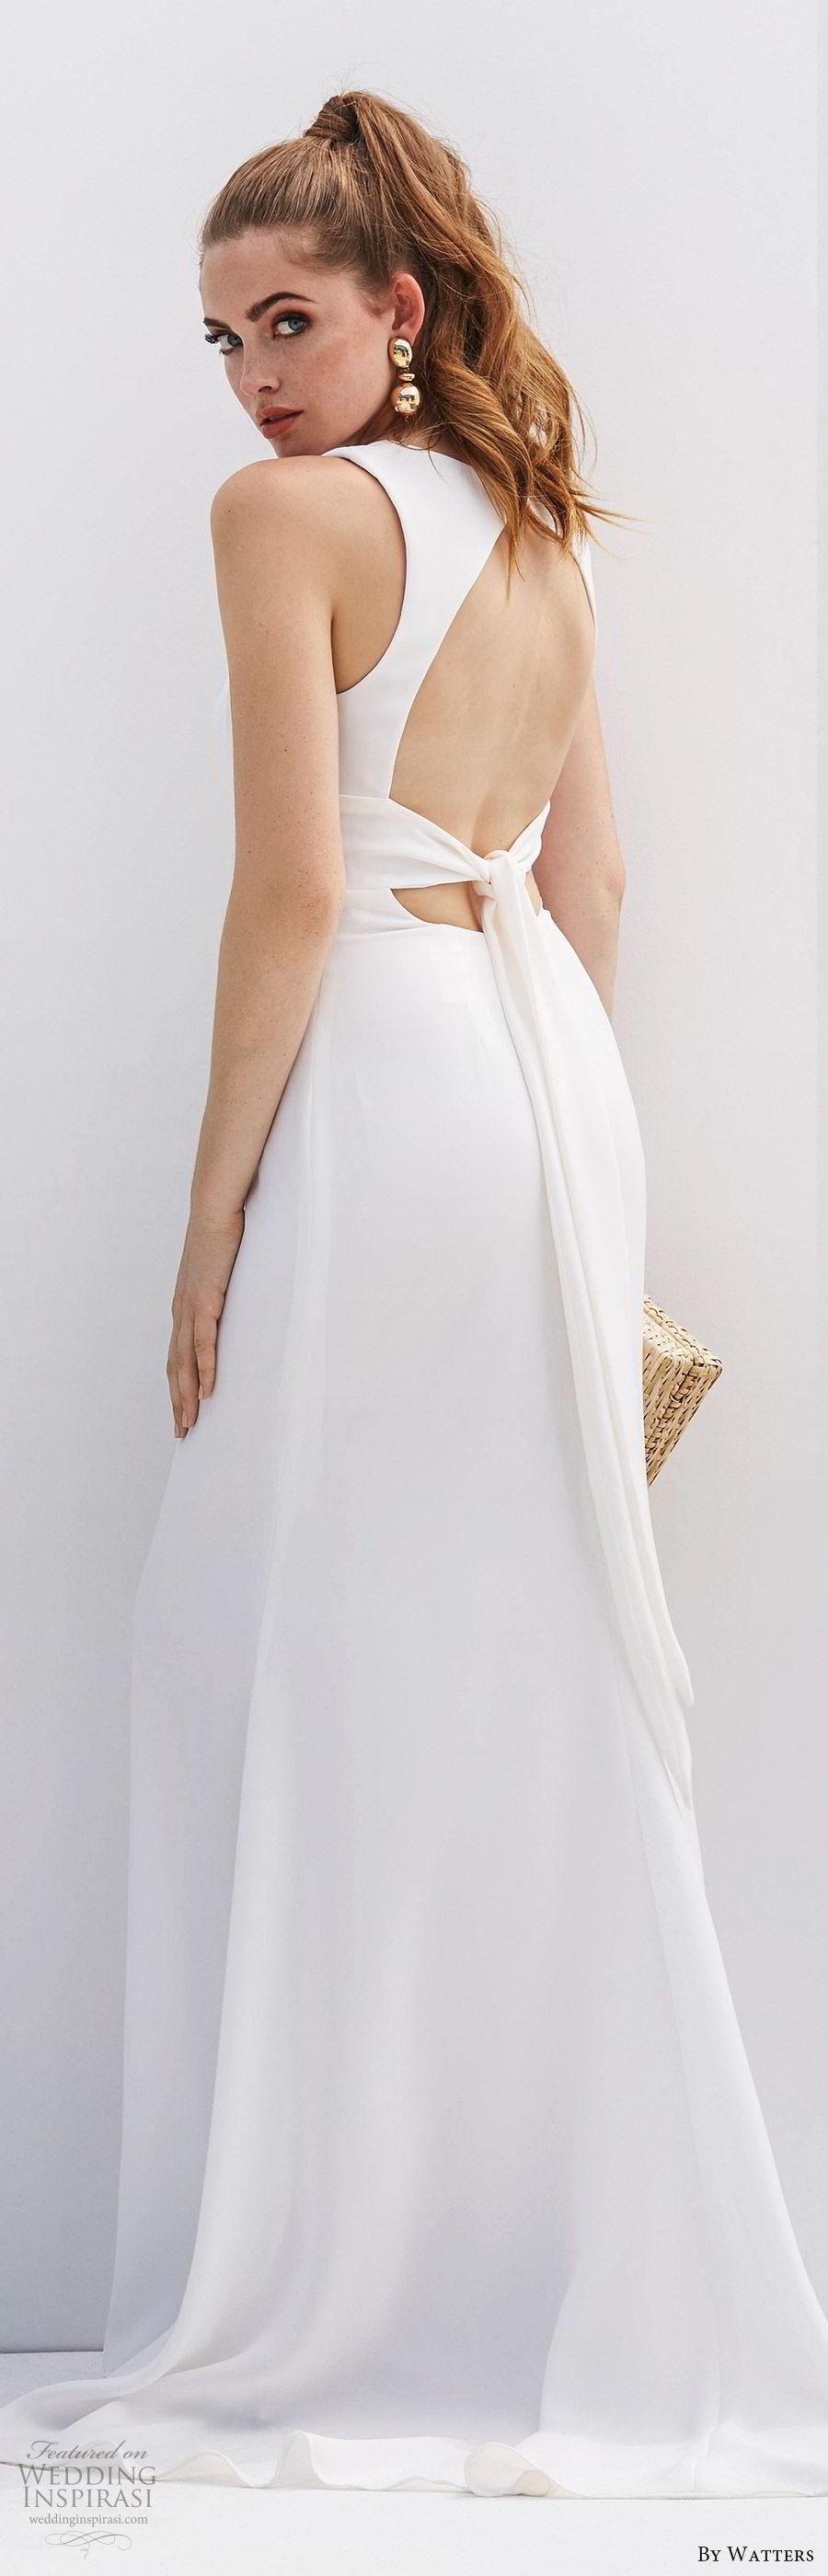 by watters 2020 bridal sleeveless deep v neckline minimally embellished sheath trumpet wedding dress (3) cutout back sweep train clean chic elegant bv